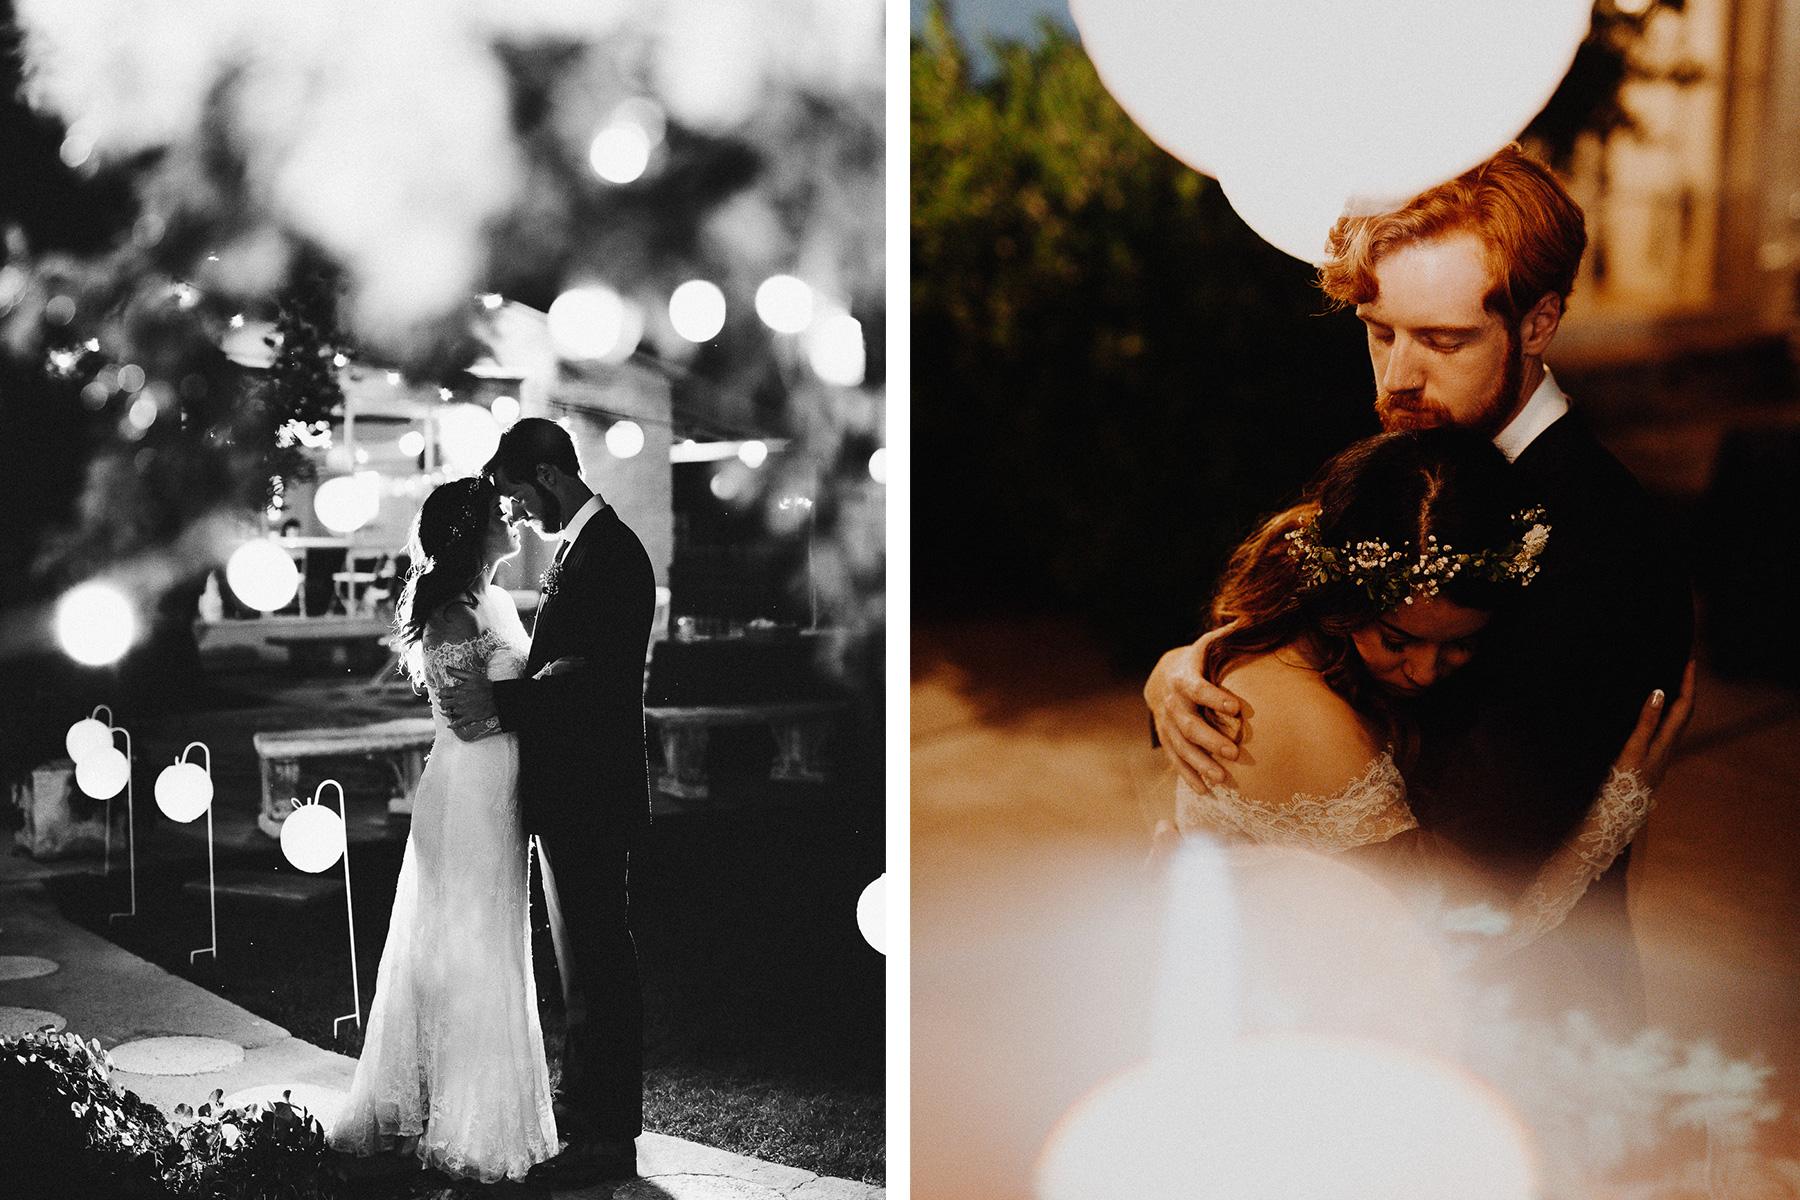 181104-Luxium-Weddings-Arizona-@matt__Le-Brandon-Kariana-Phoenix-Valley-Garden-Center-1147a.jpg